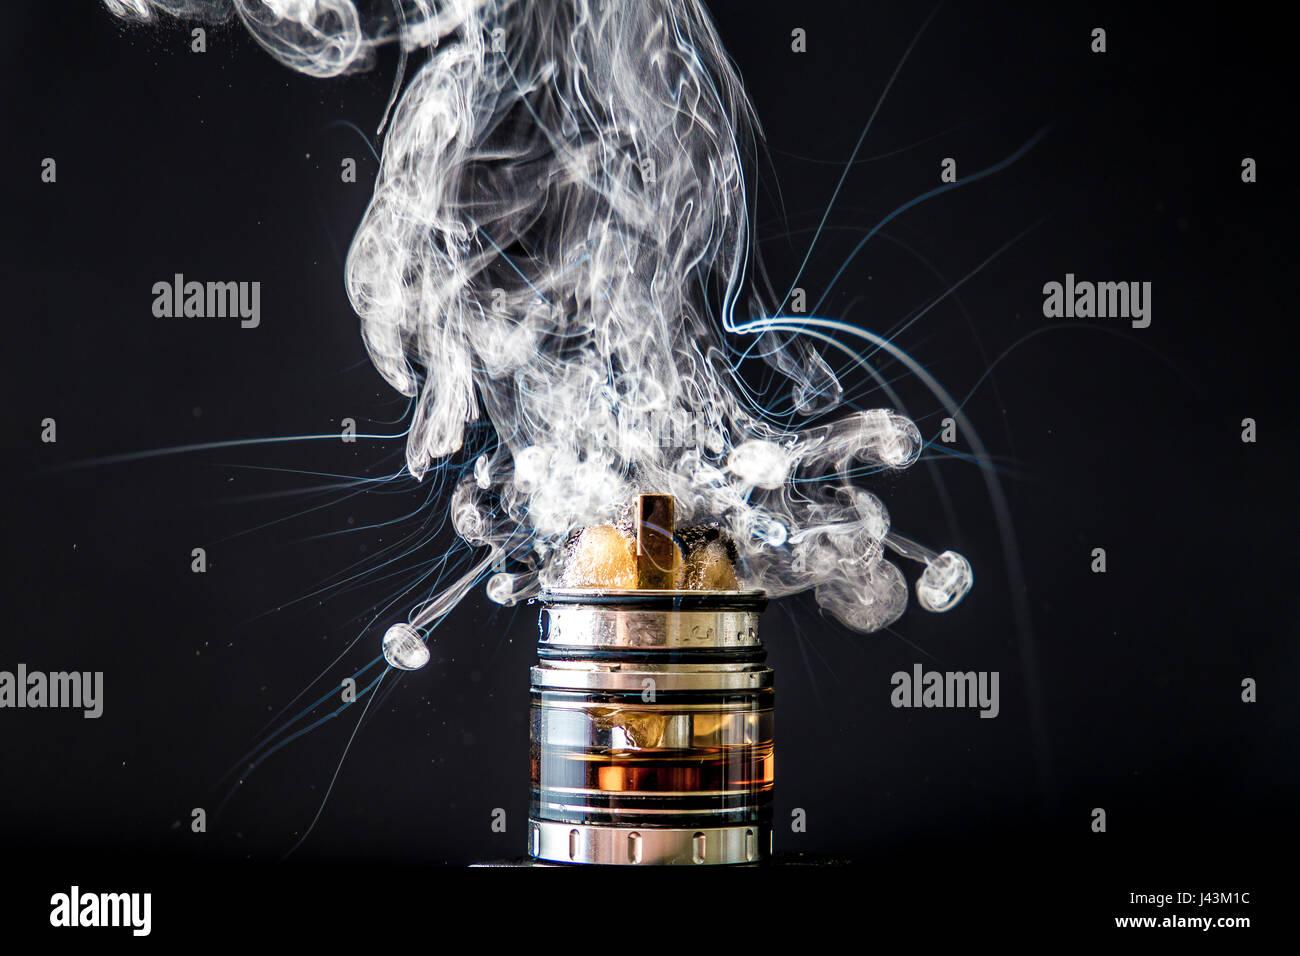 Vaporizer smoke explosion on isolated black background in studio - Stock Image